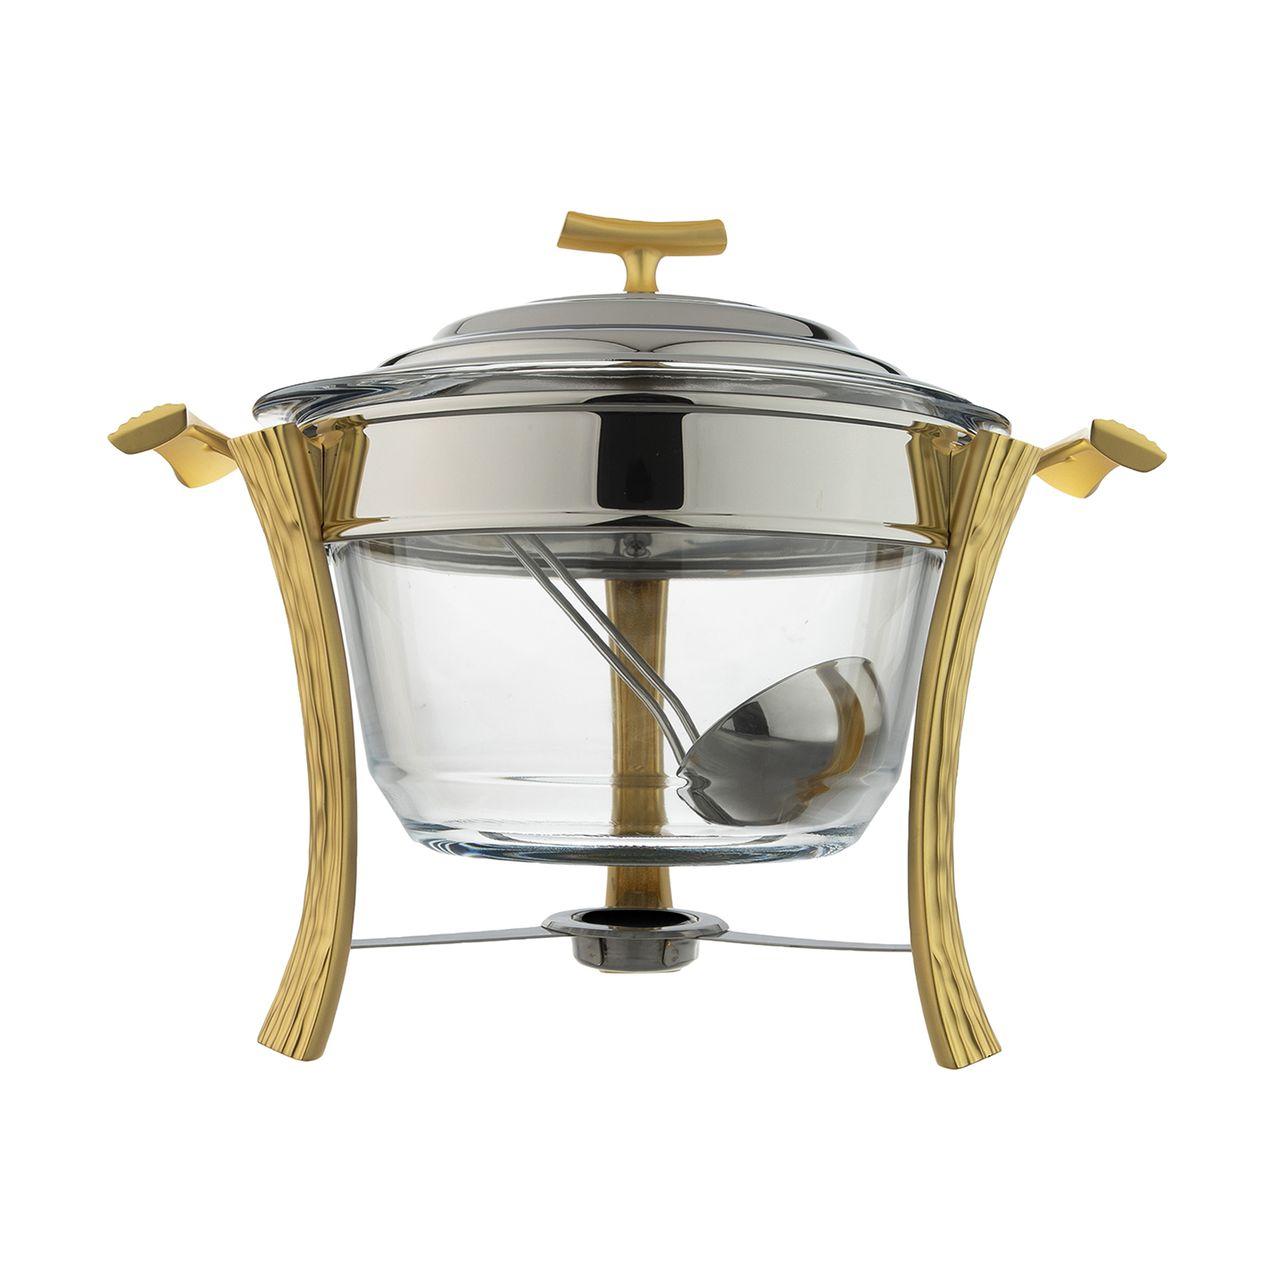 سوپ خوری ریجنت مدل 1741B7